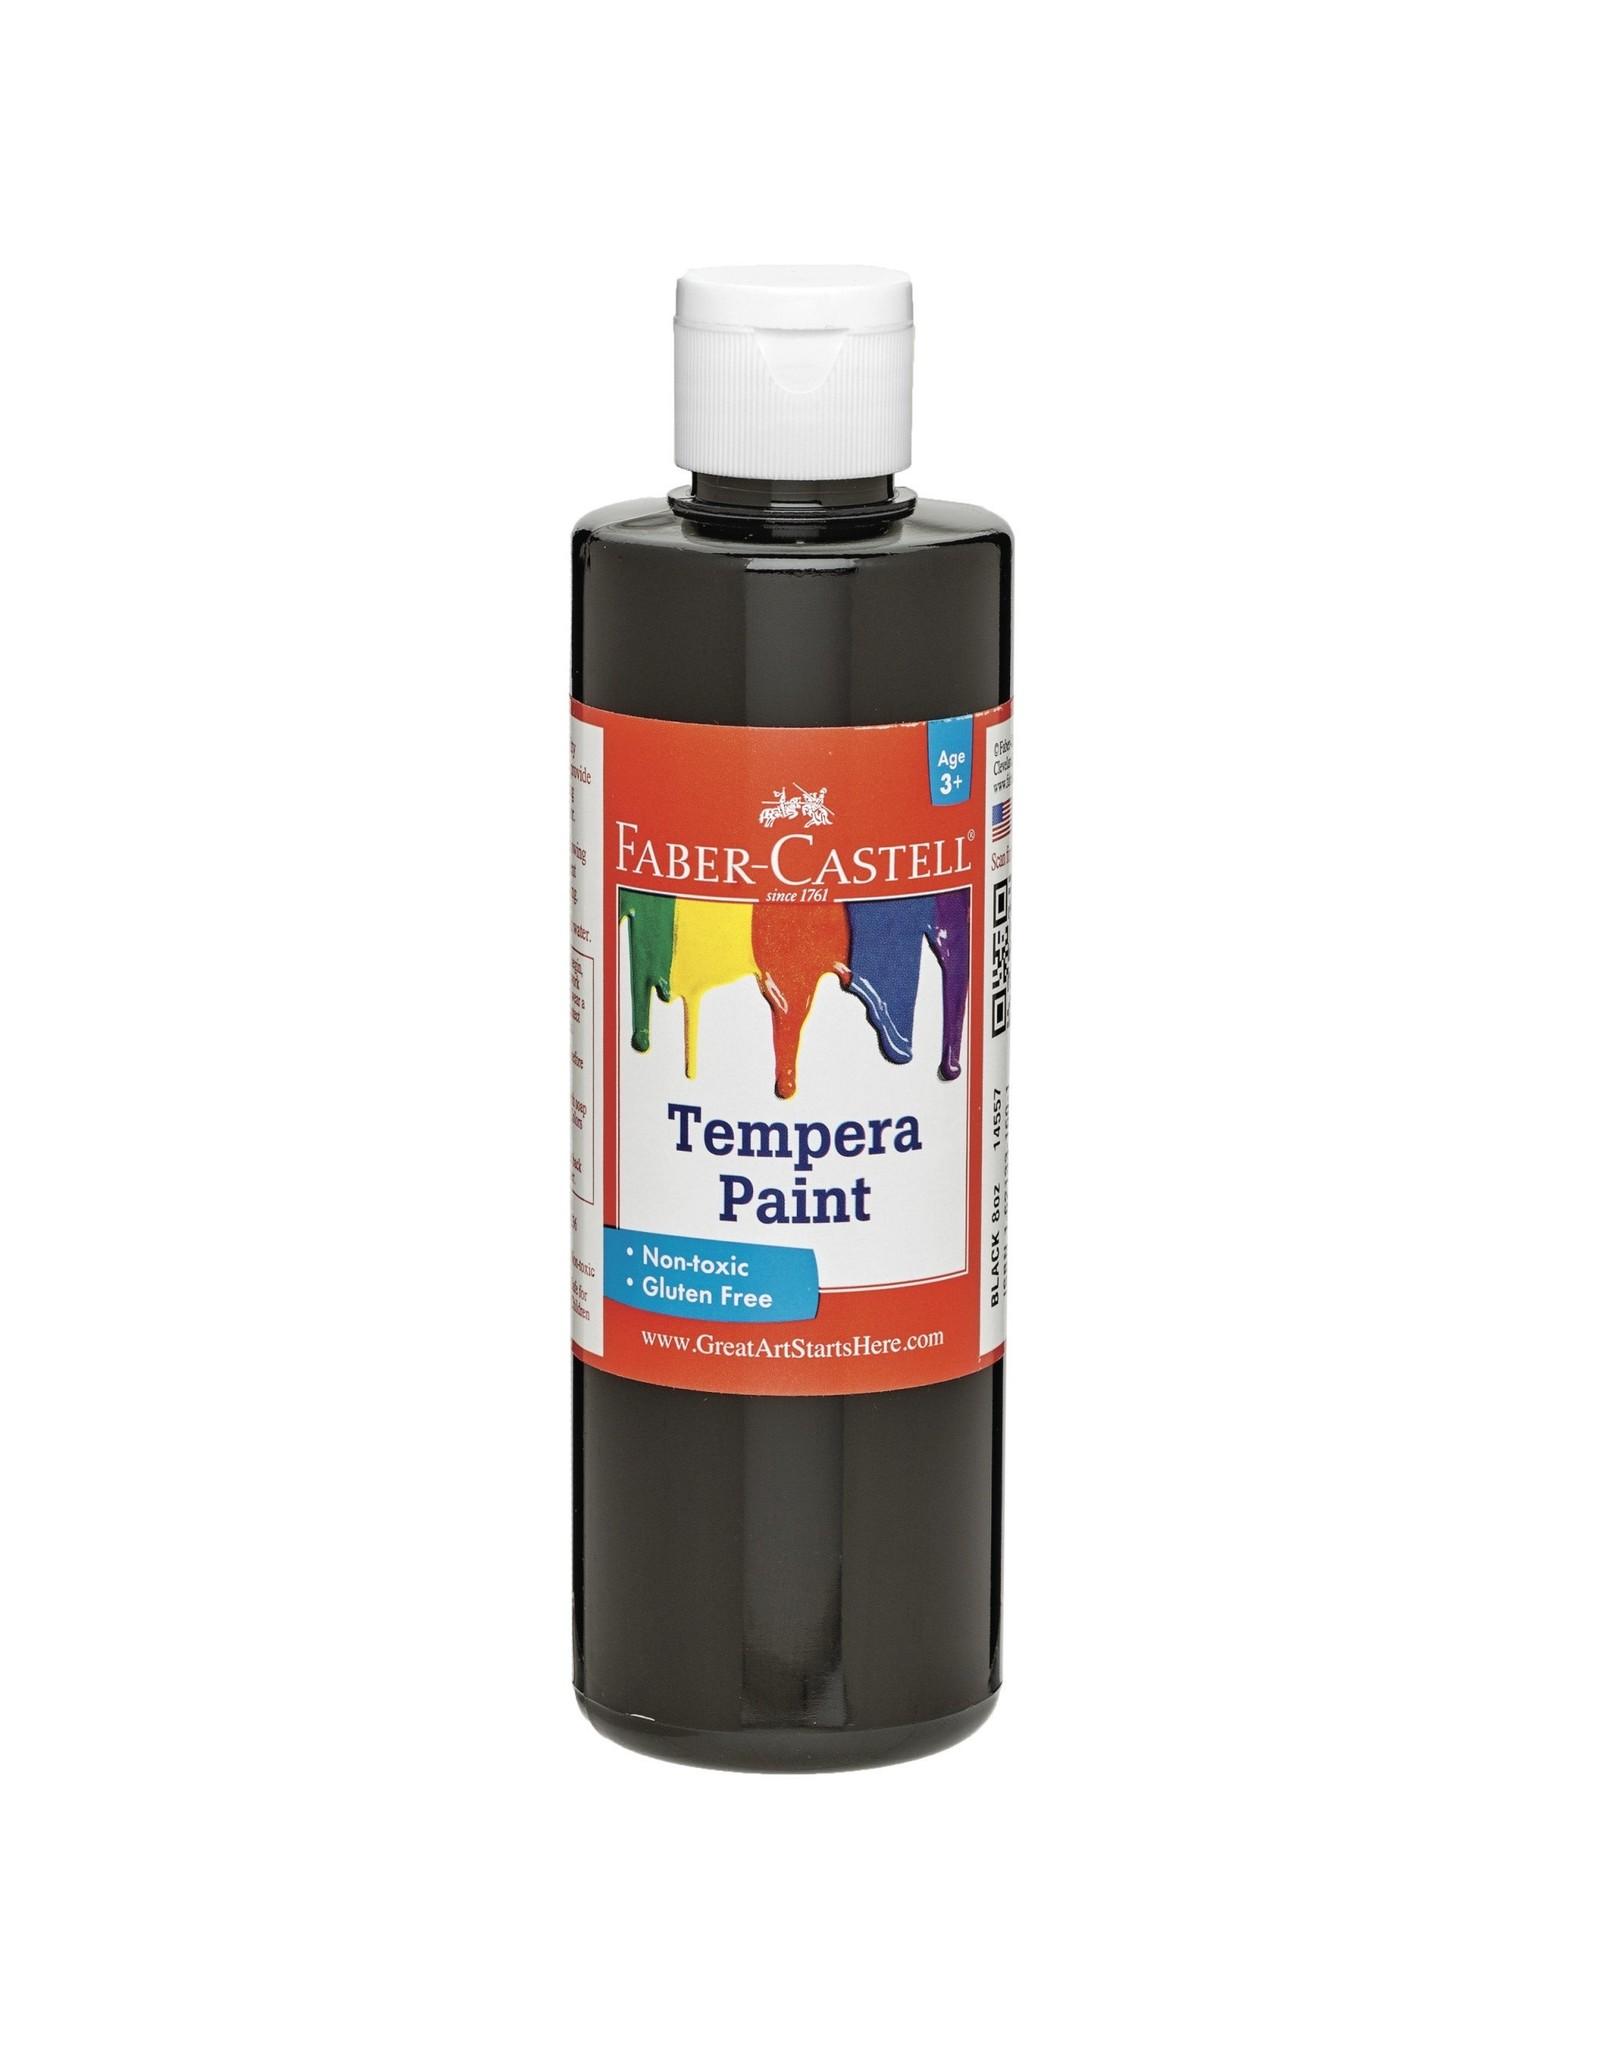 Faber-Castell Black Tempera Paint (8 oz bottles)